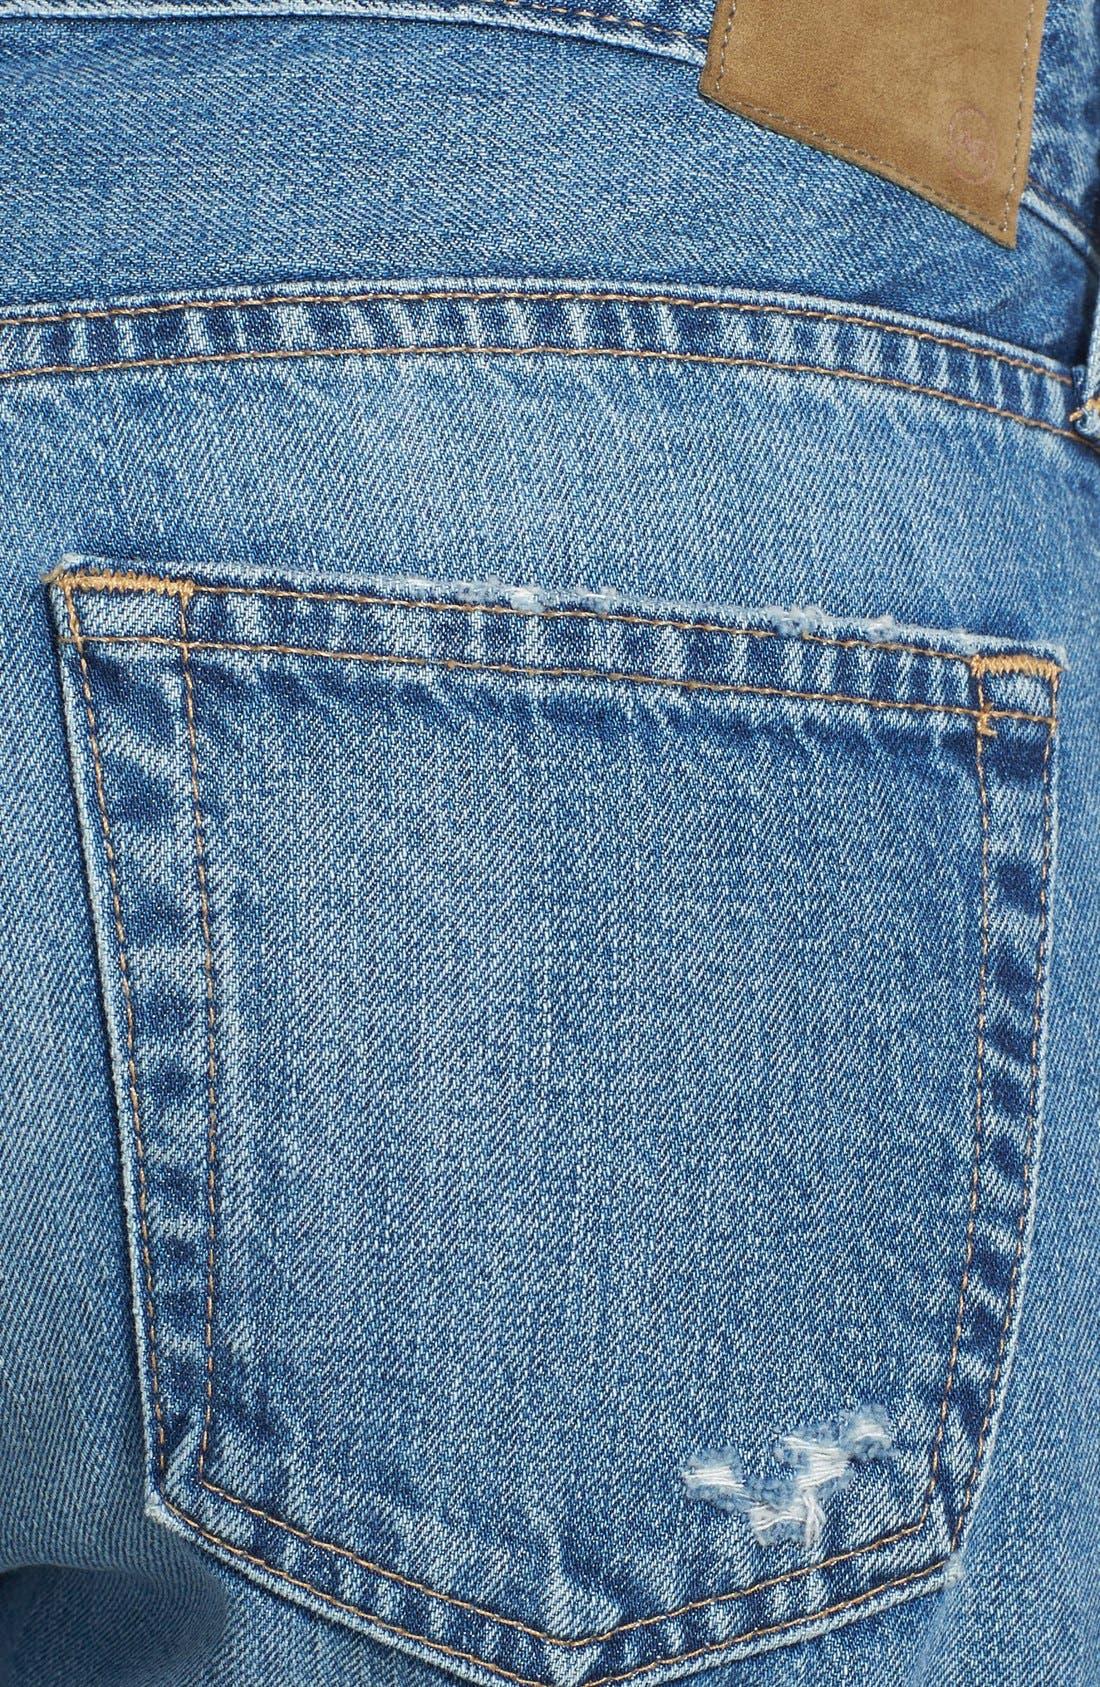 Alternate Image 3  - AG 'Drew' Destroyed Boyfriend Jeans (14 Year Tailspin)